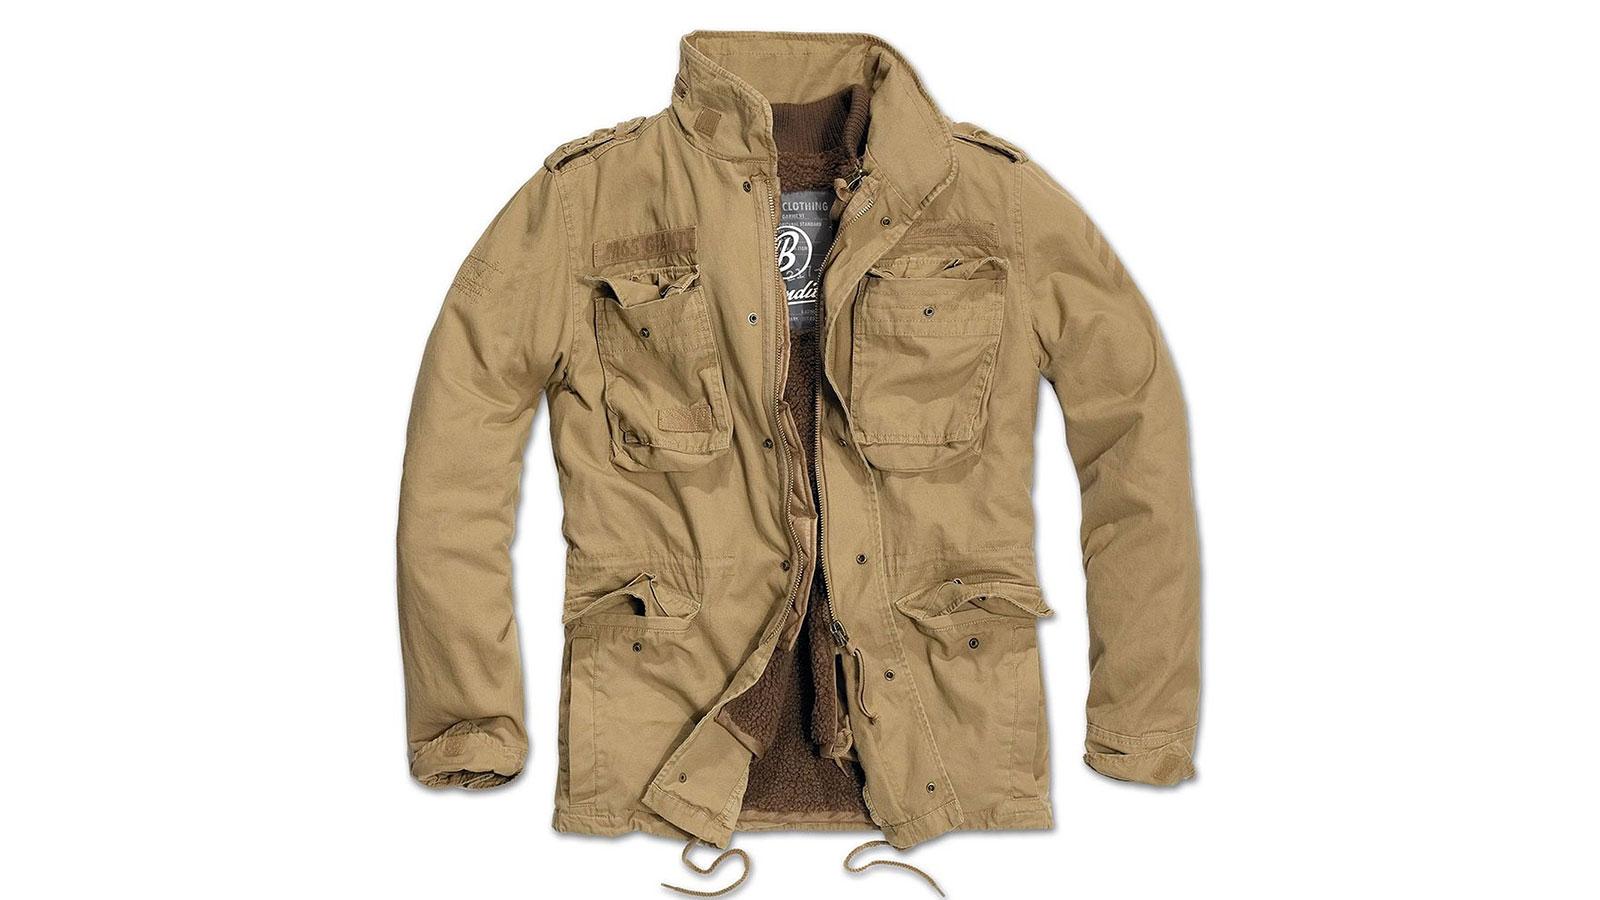 841e9e695 The Best Men's Field Jackets | Muted.